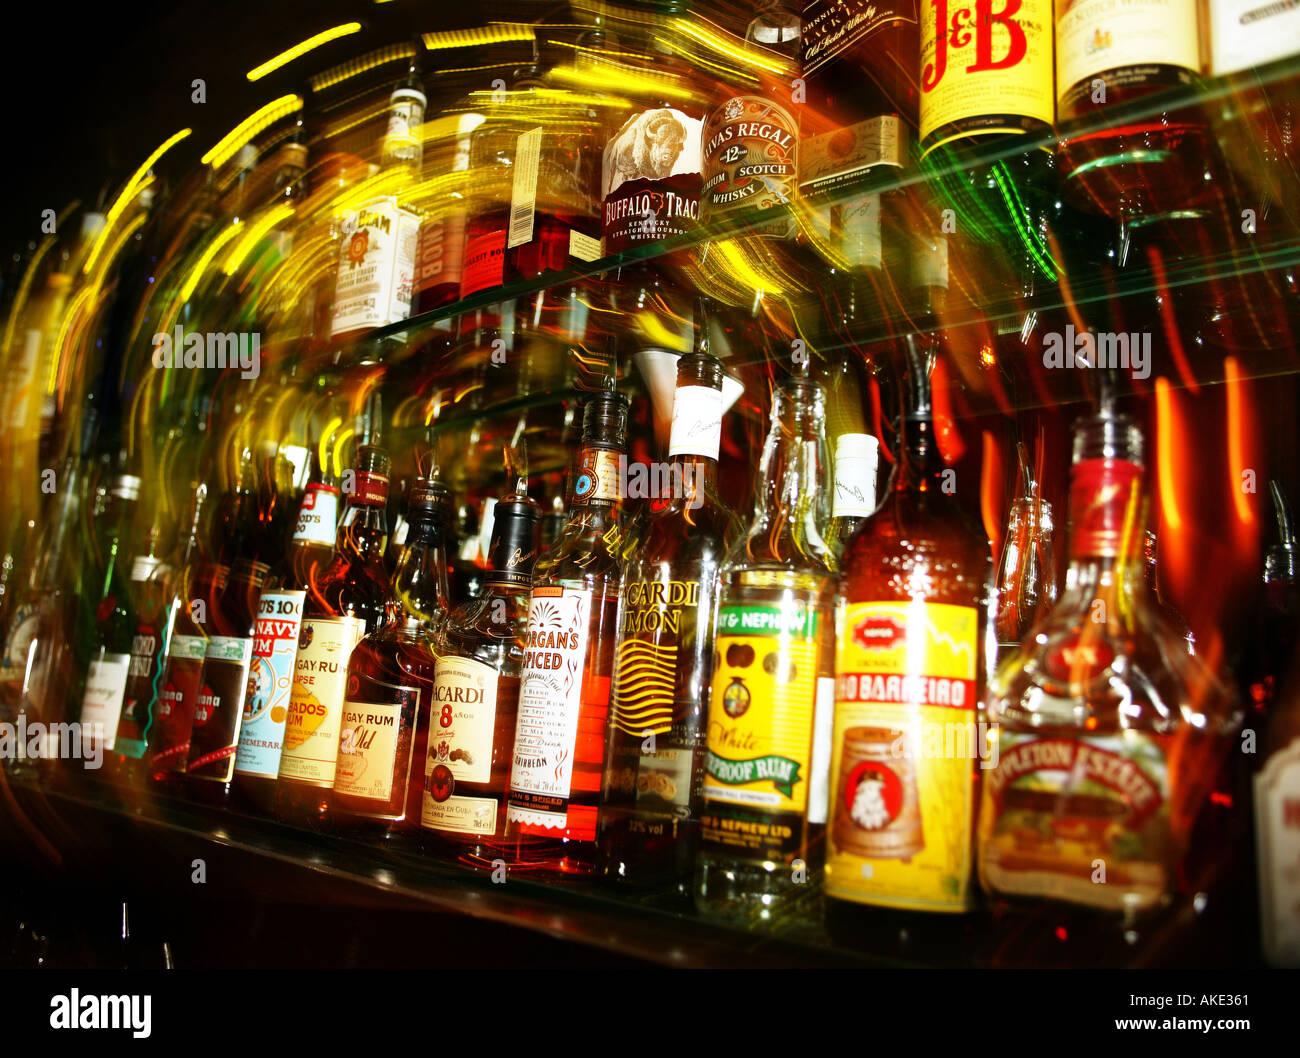 Backbar Stockfotos & Backbar Bilder - Alamy